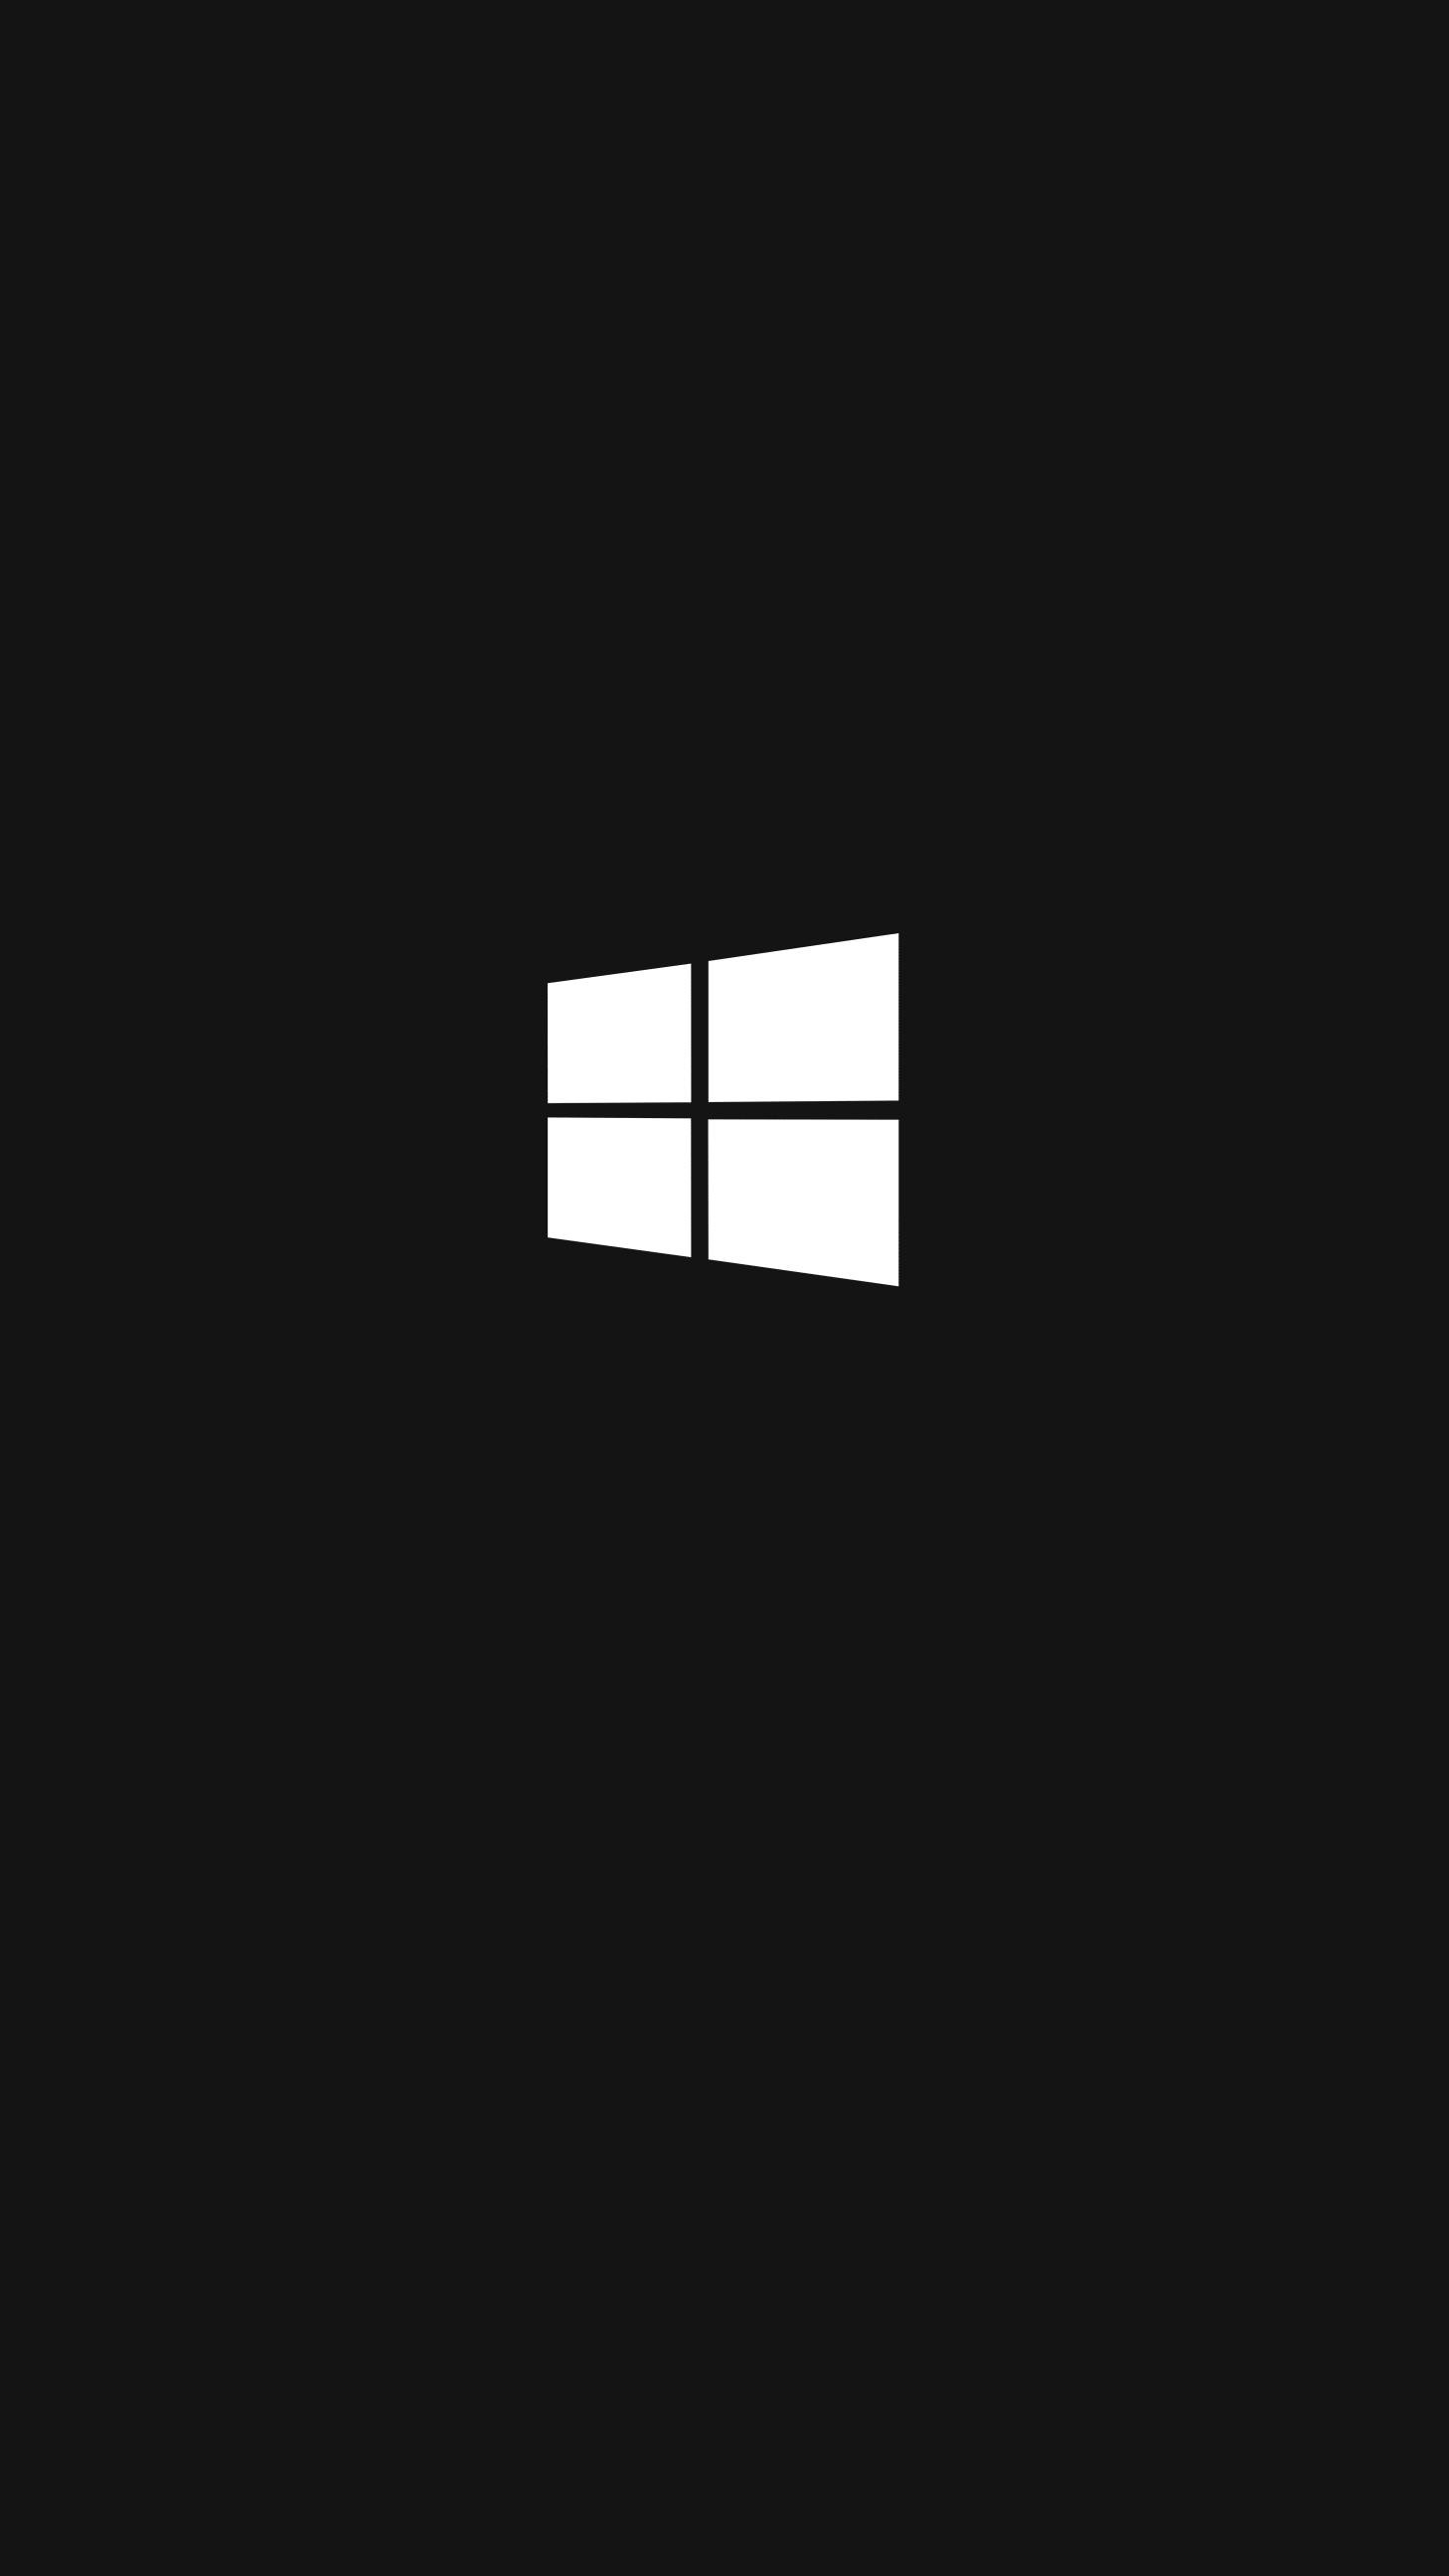 Windows 10 iPhone Wallpaper